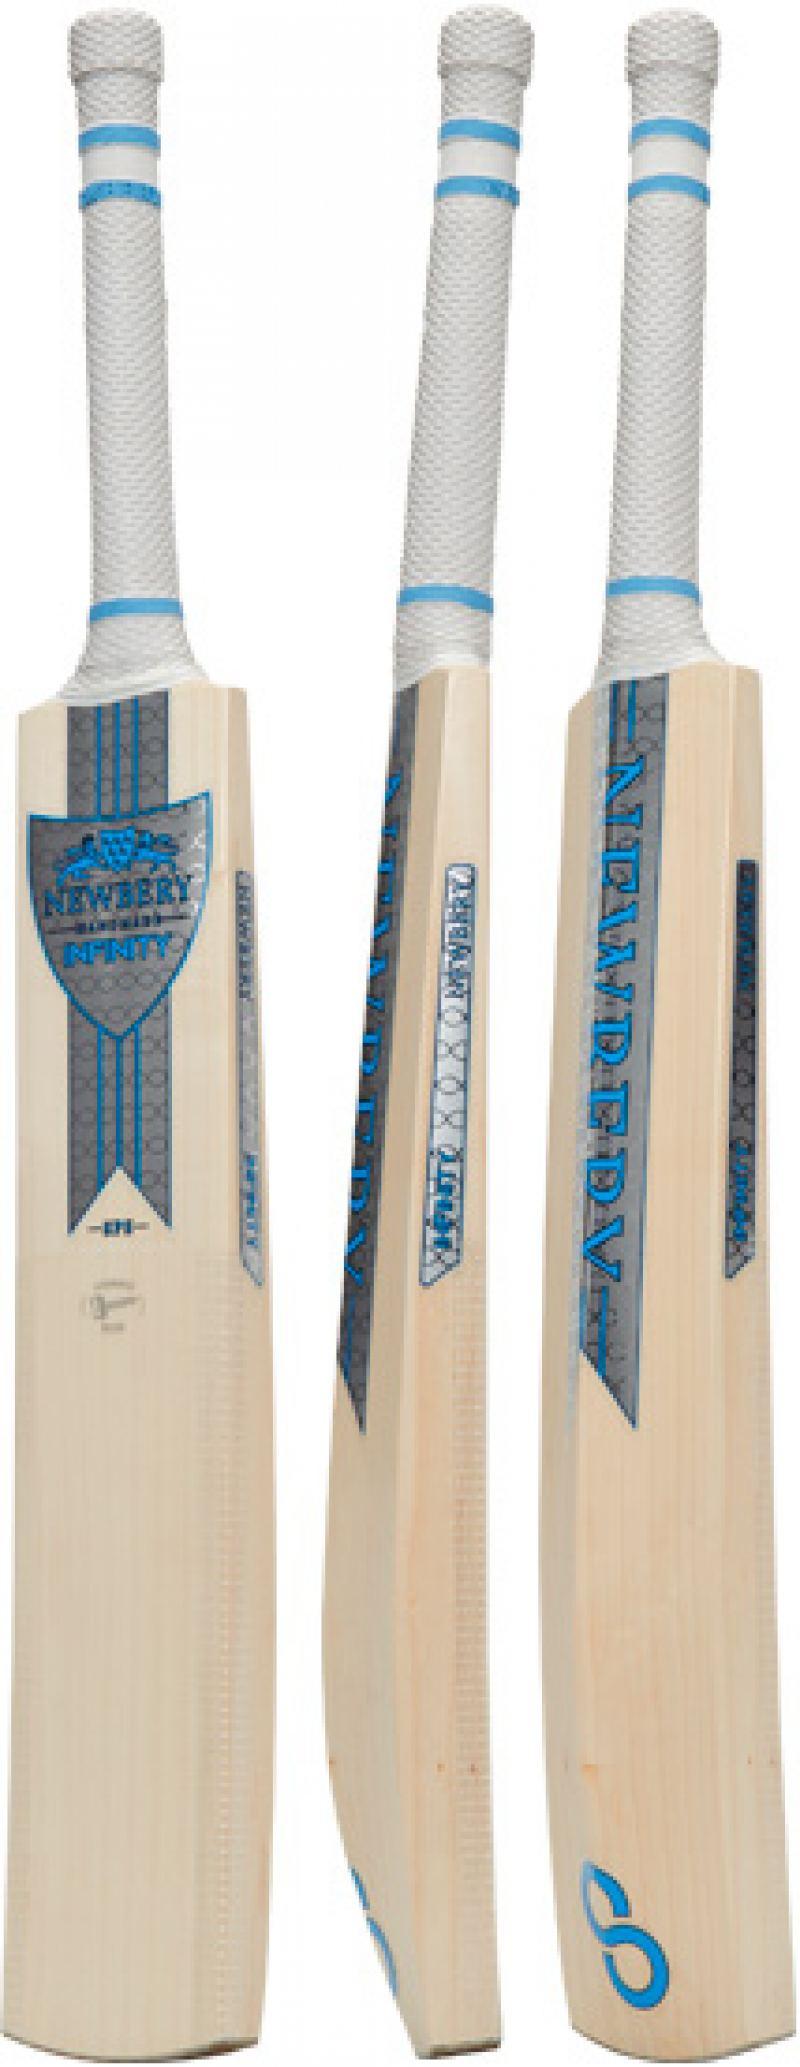 Newbery Infinity SPS Cricket Bat